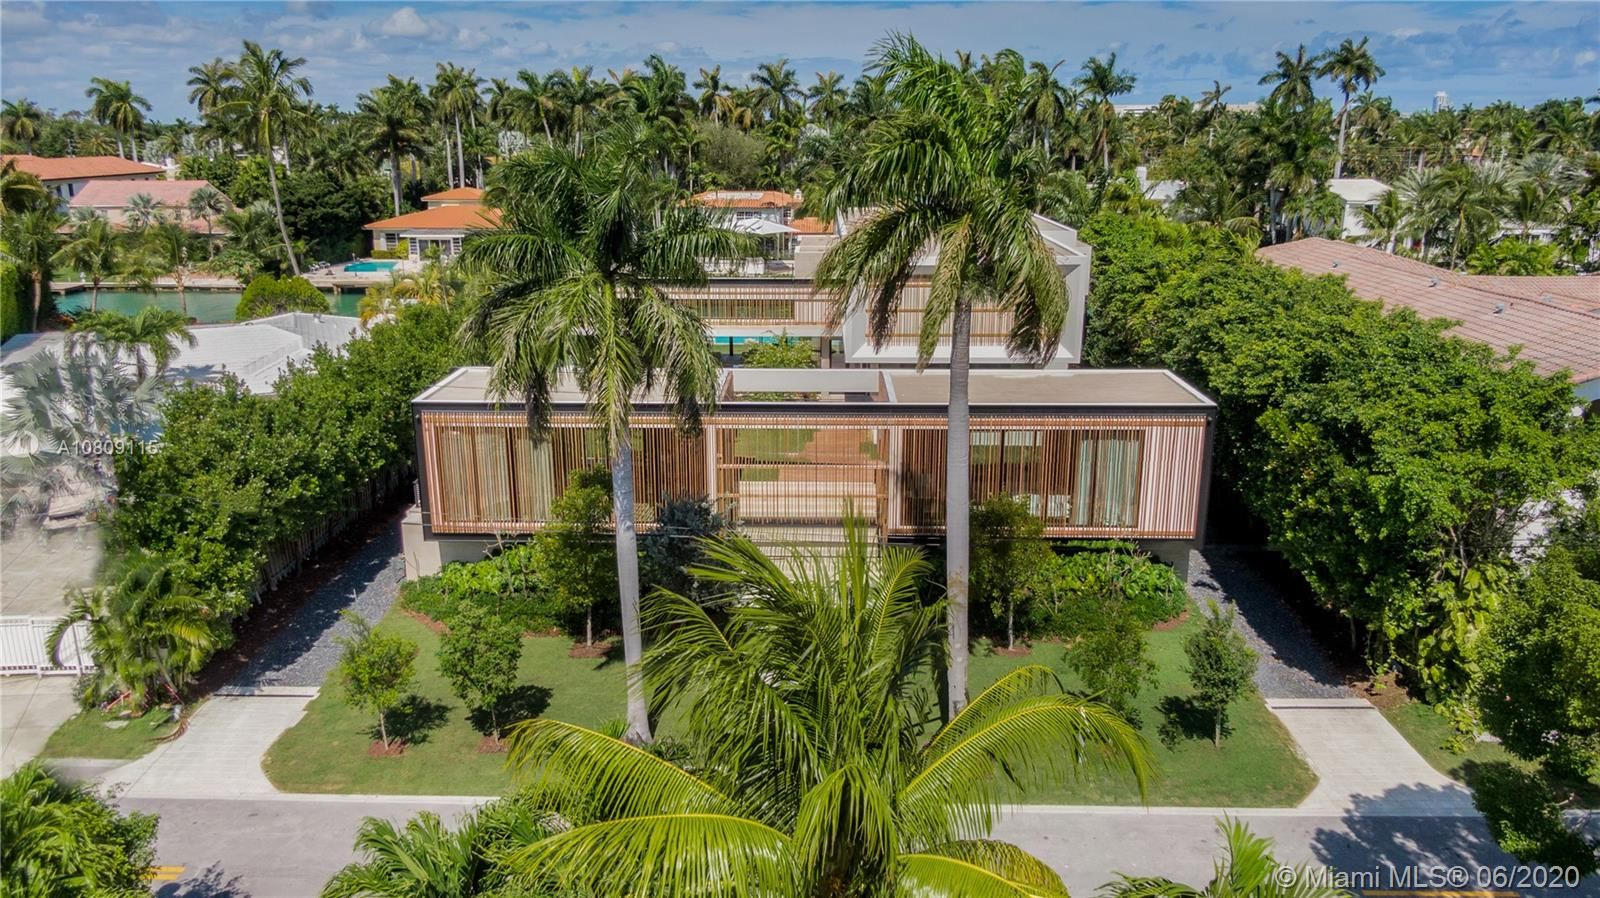 Photo 51 of Listing MLS a10809115 in 1635 W 22nd St Miami Beach FL 33140